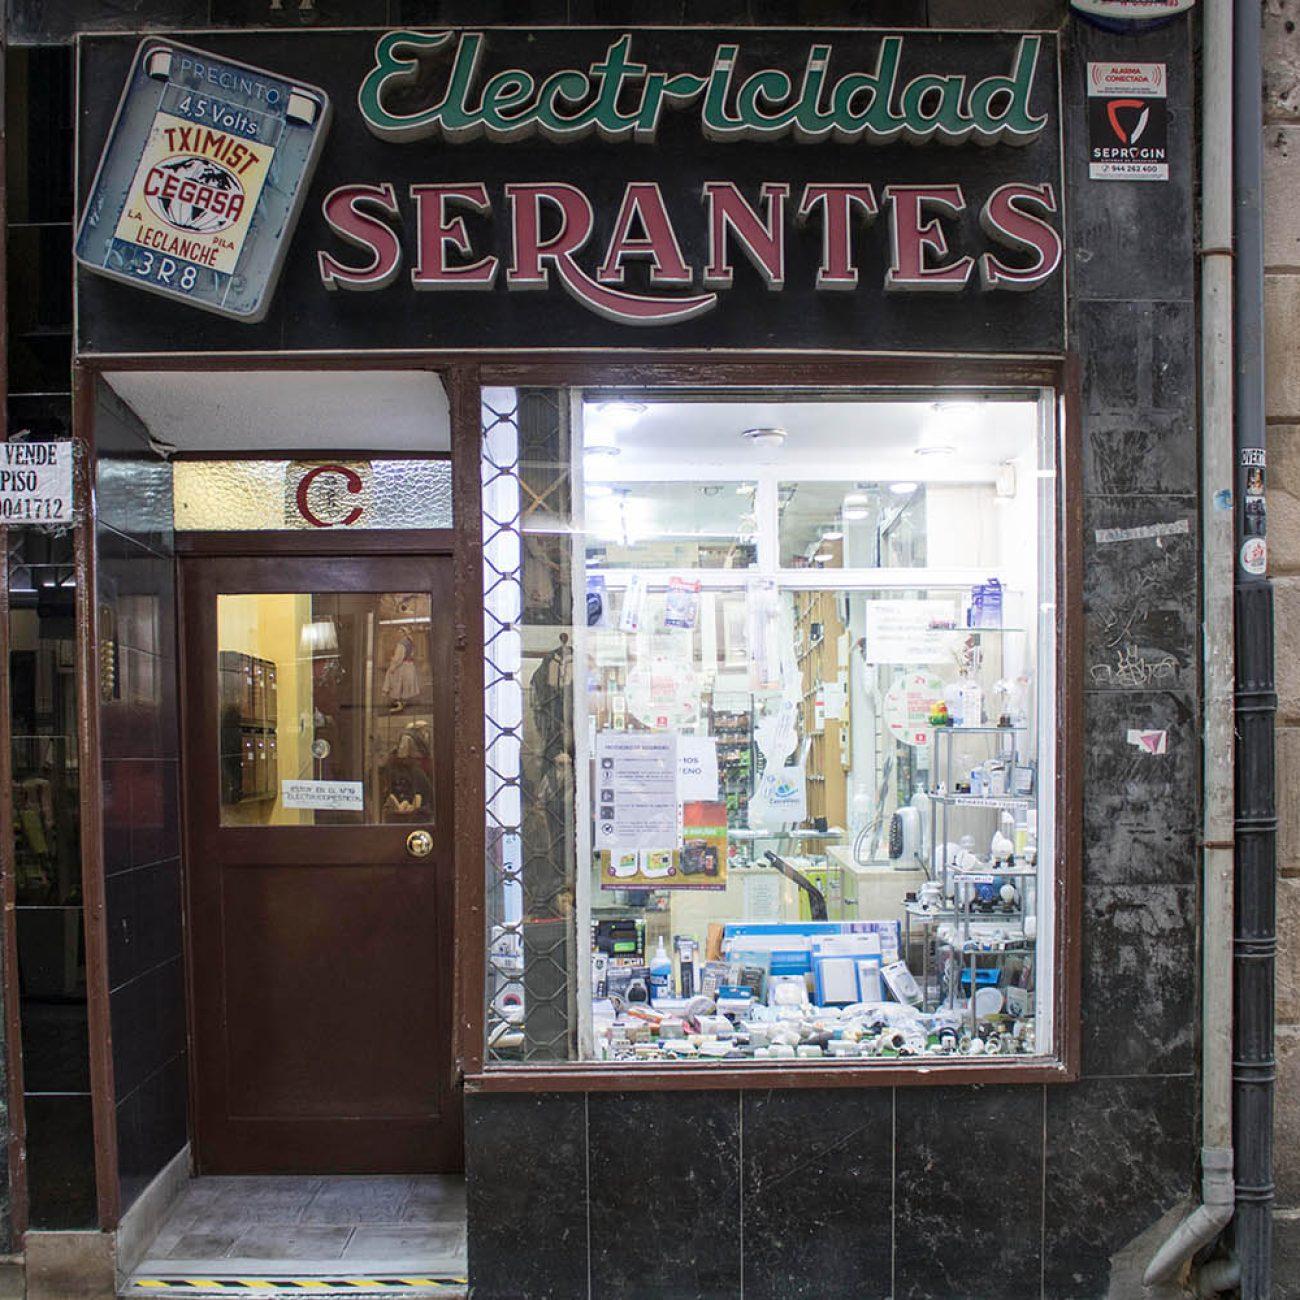 ELECTRODOMESTICOS SERANTES